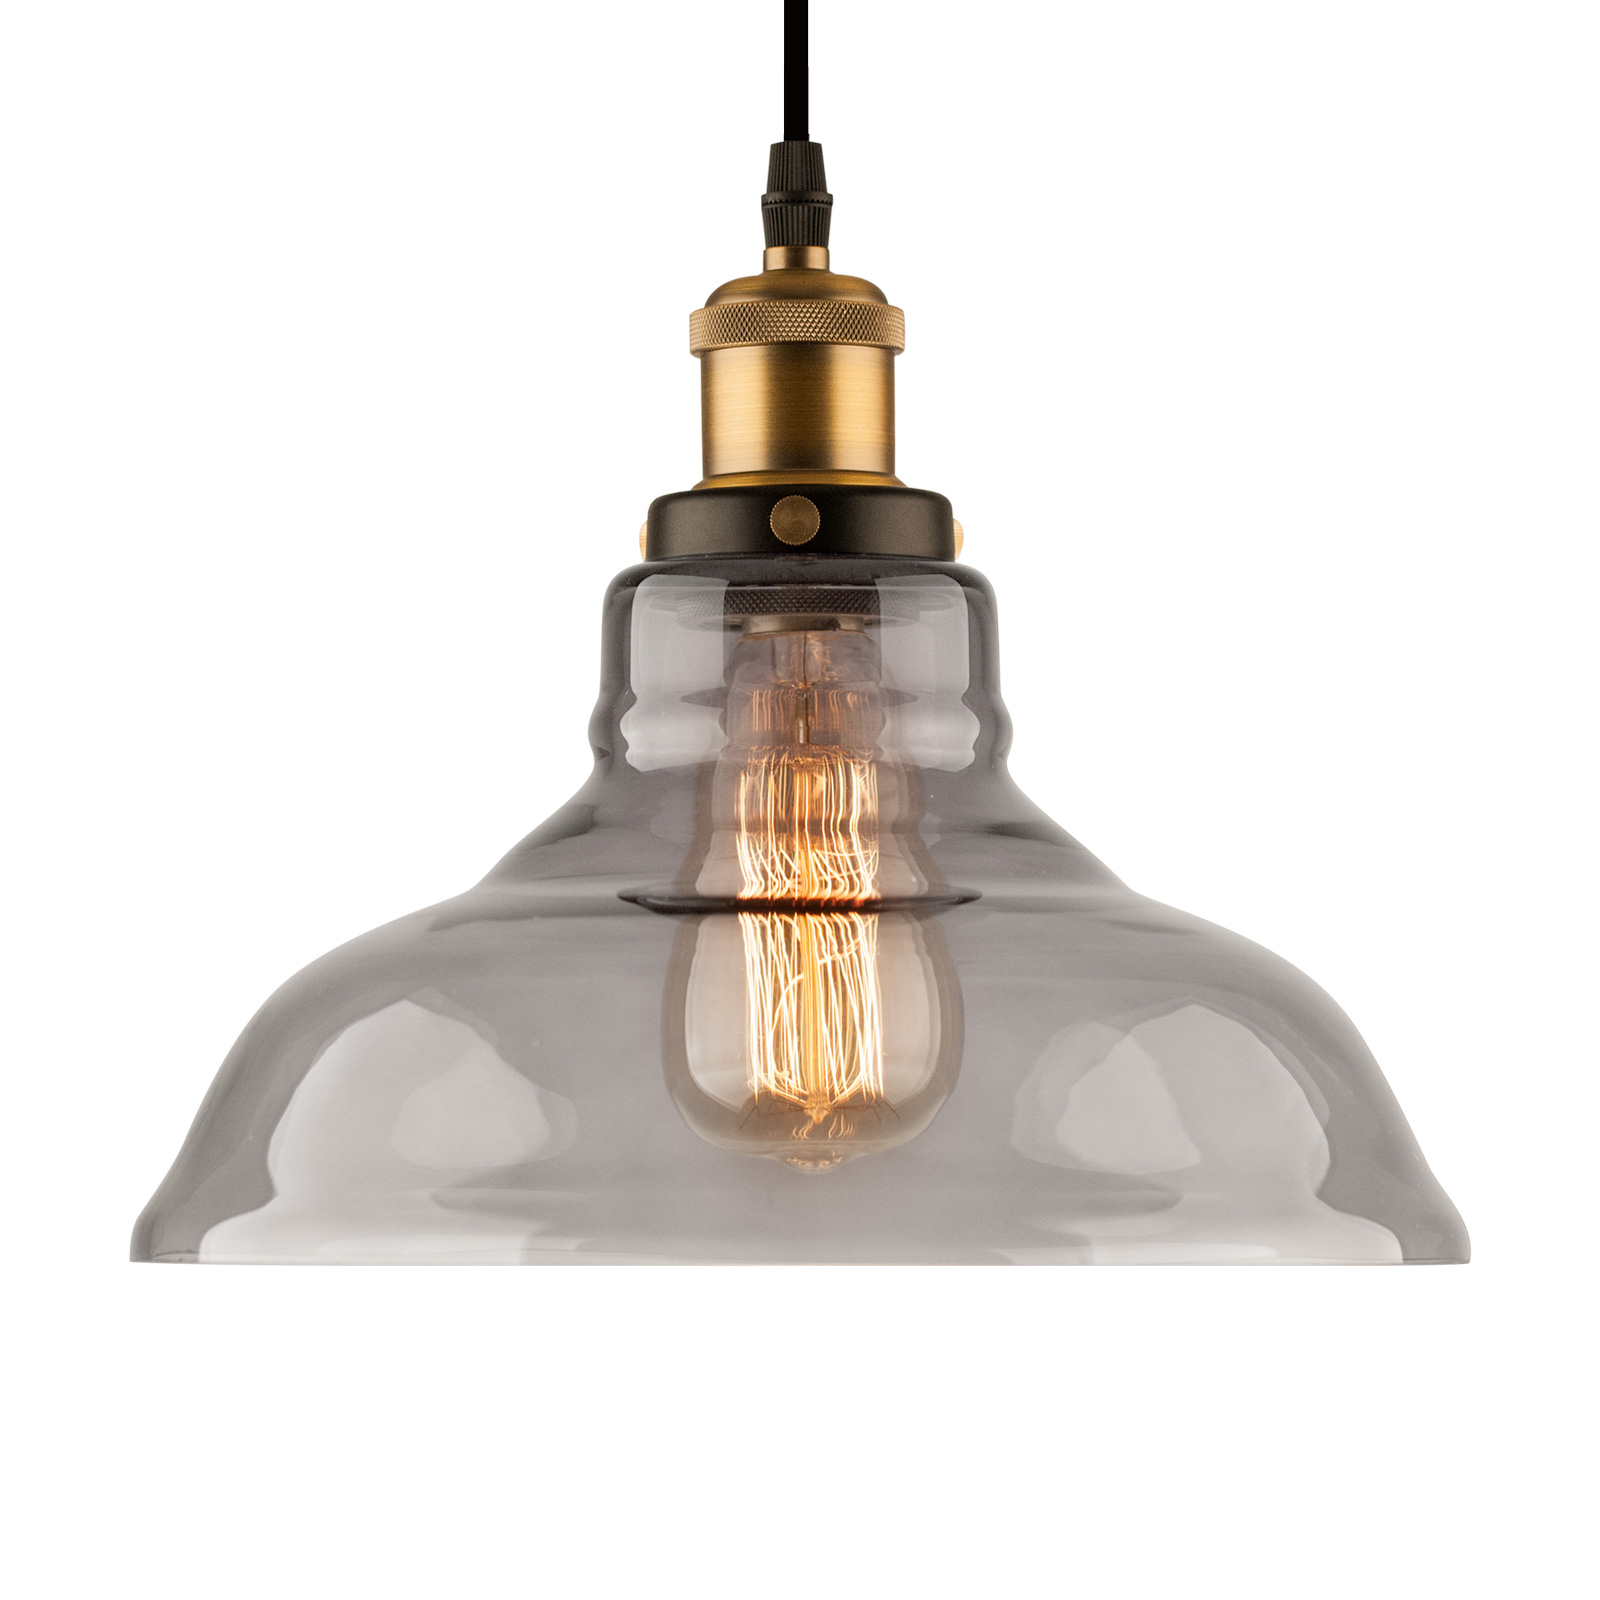 Hanglamp LA040 E27 Ø 28 cm messing/rookgrijs